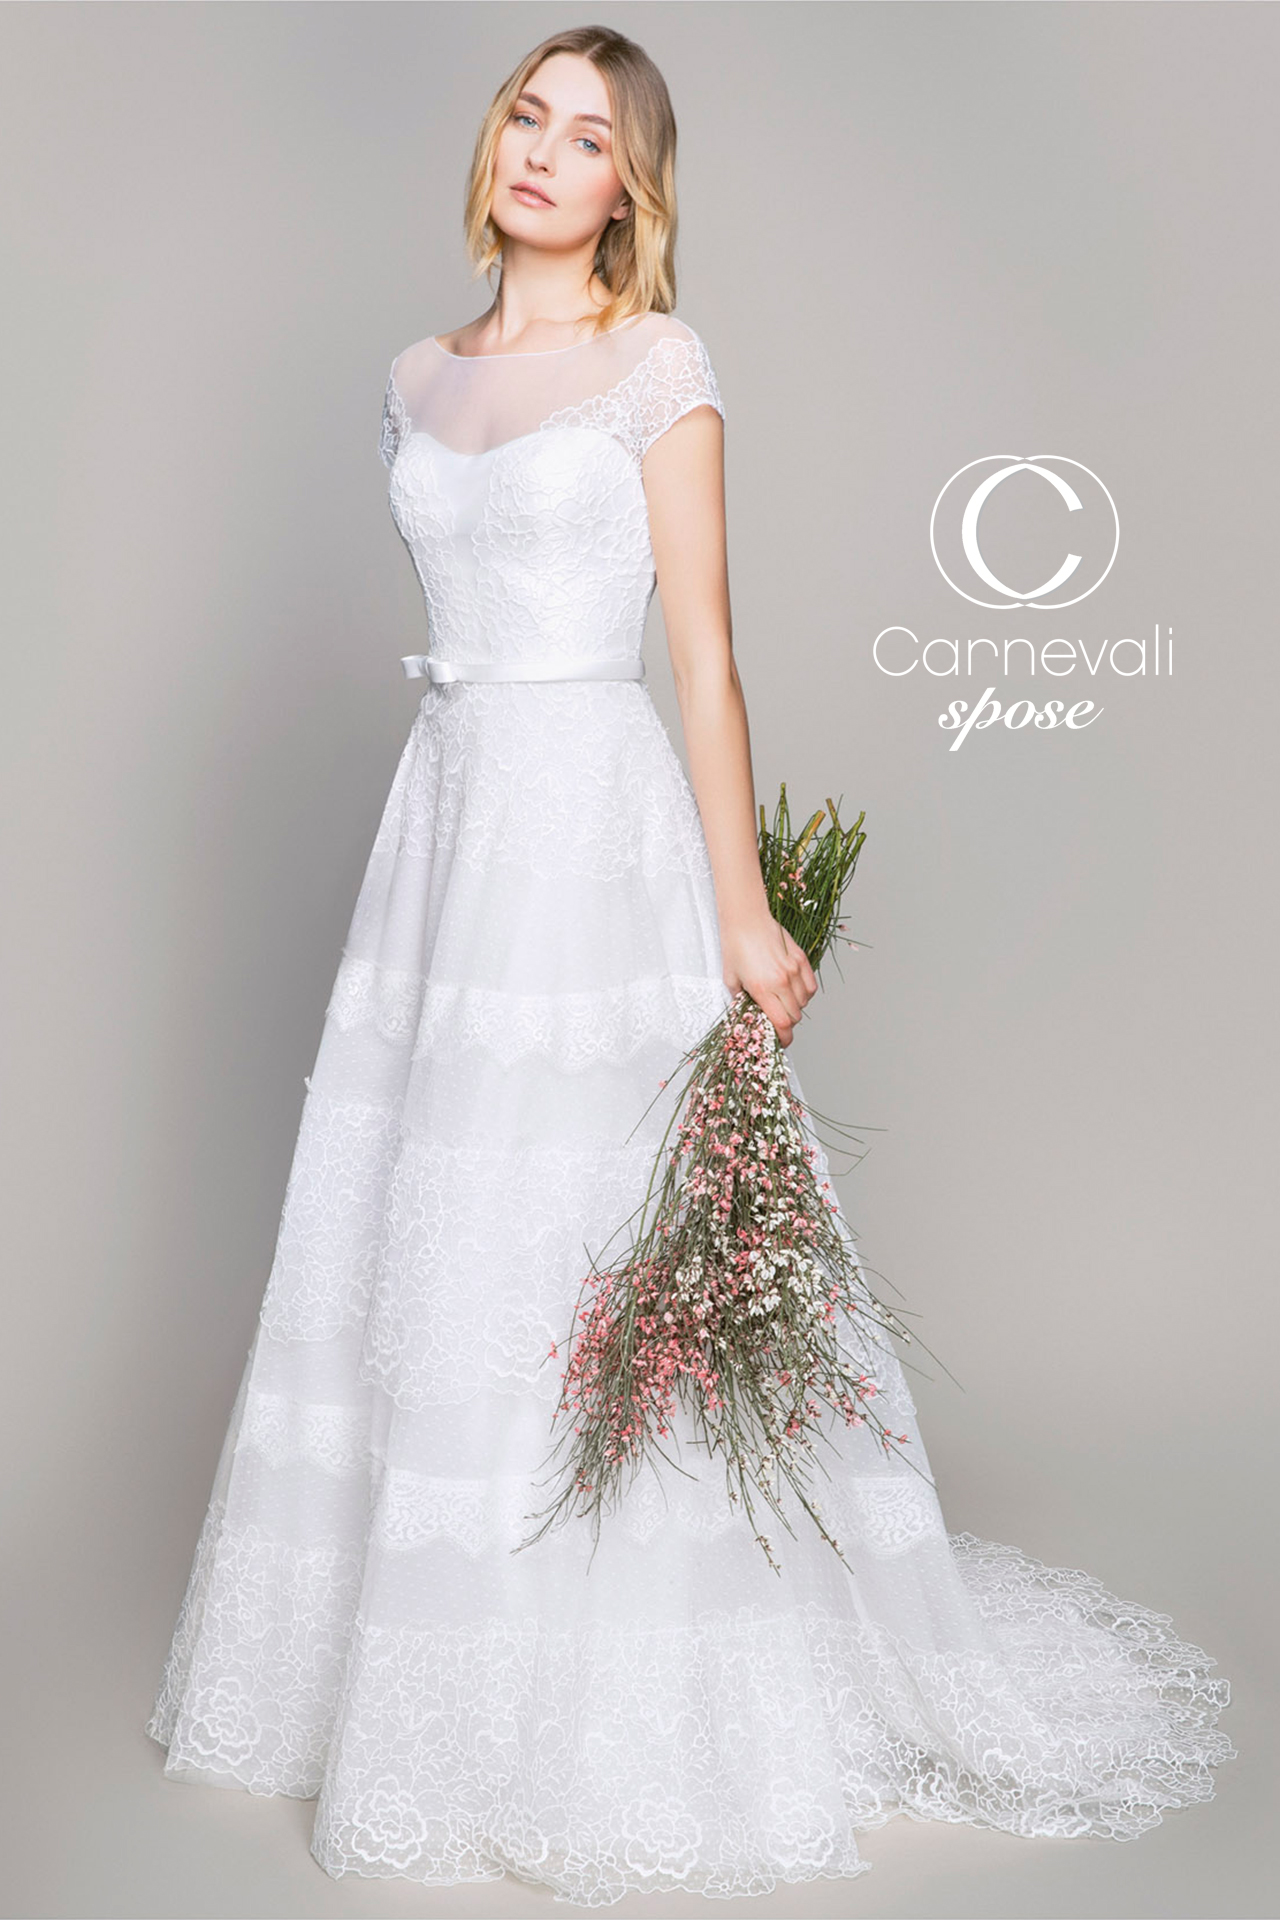 58c0317fe597 BLUMARINE 6750 - Carnevali Spose